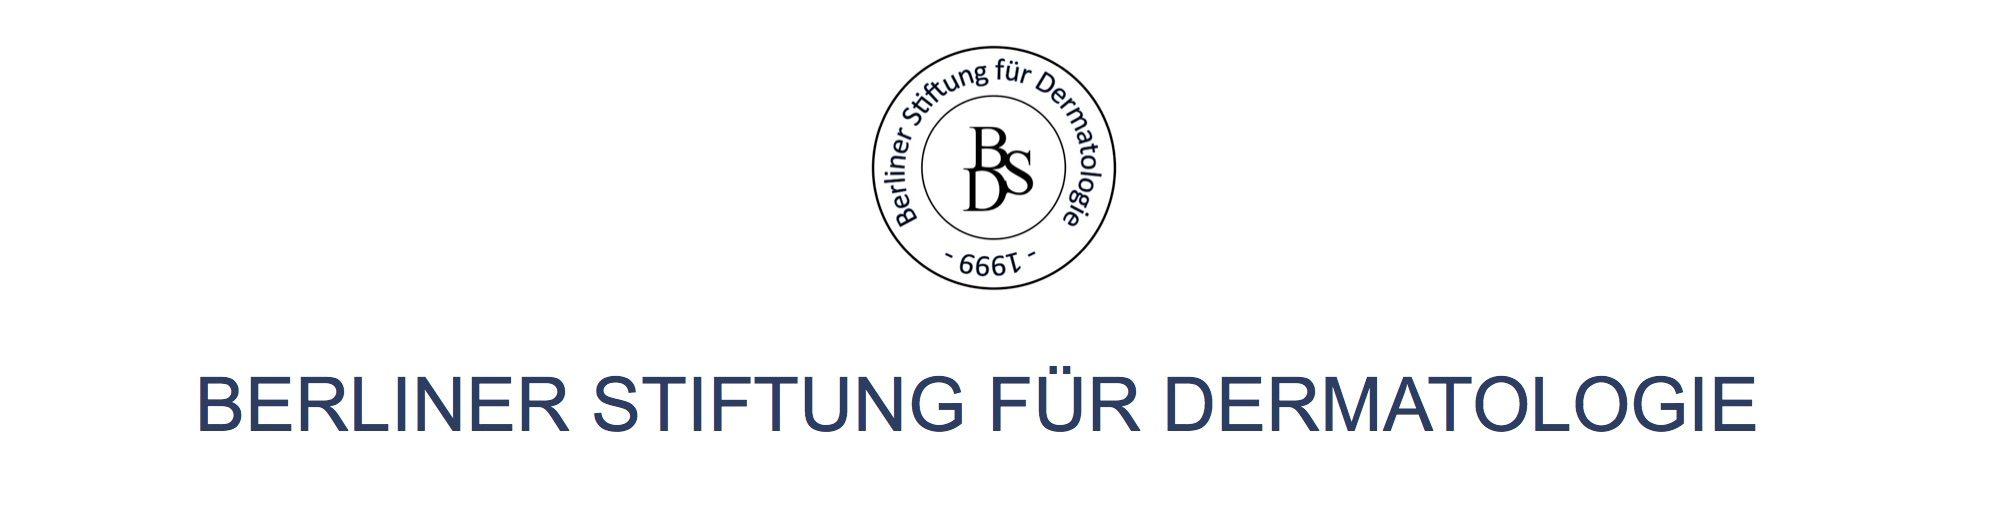 Logo von Prof. Dr. Dr. Christoph C. Geilen, Prof. Dr. Rudolf Stadler